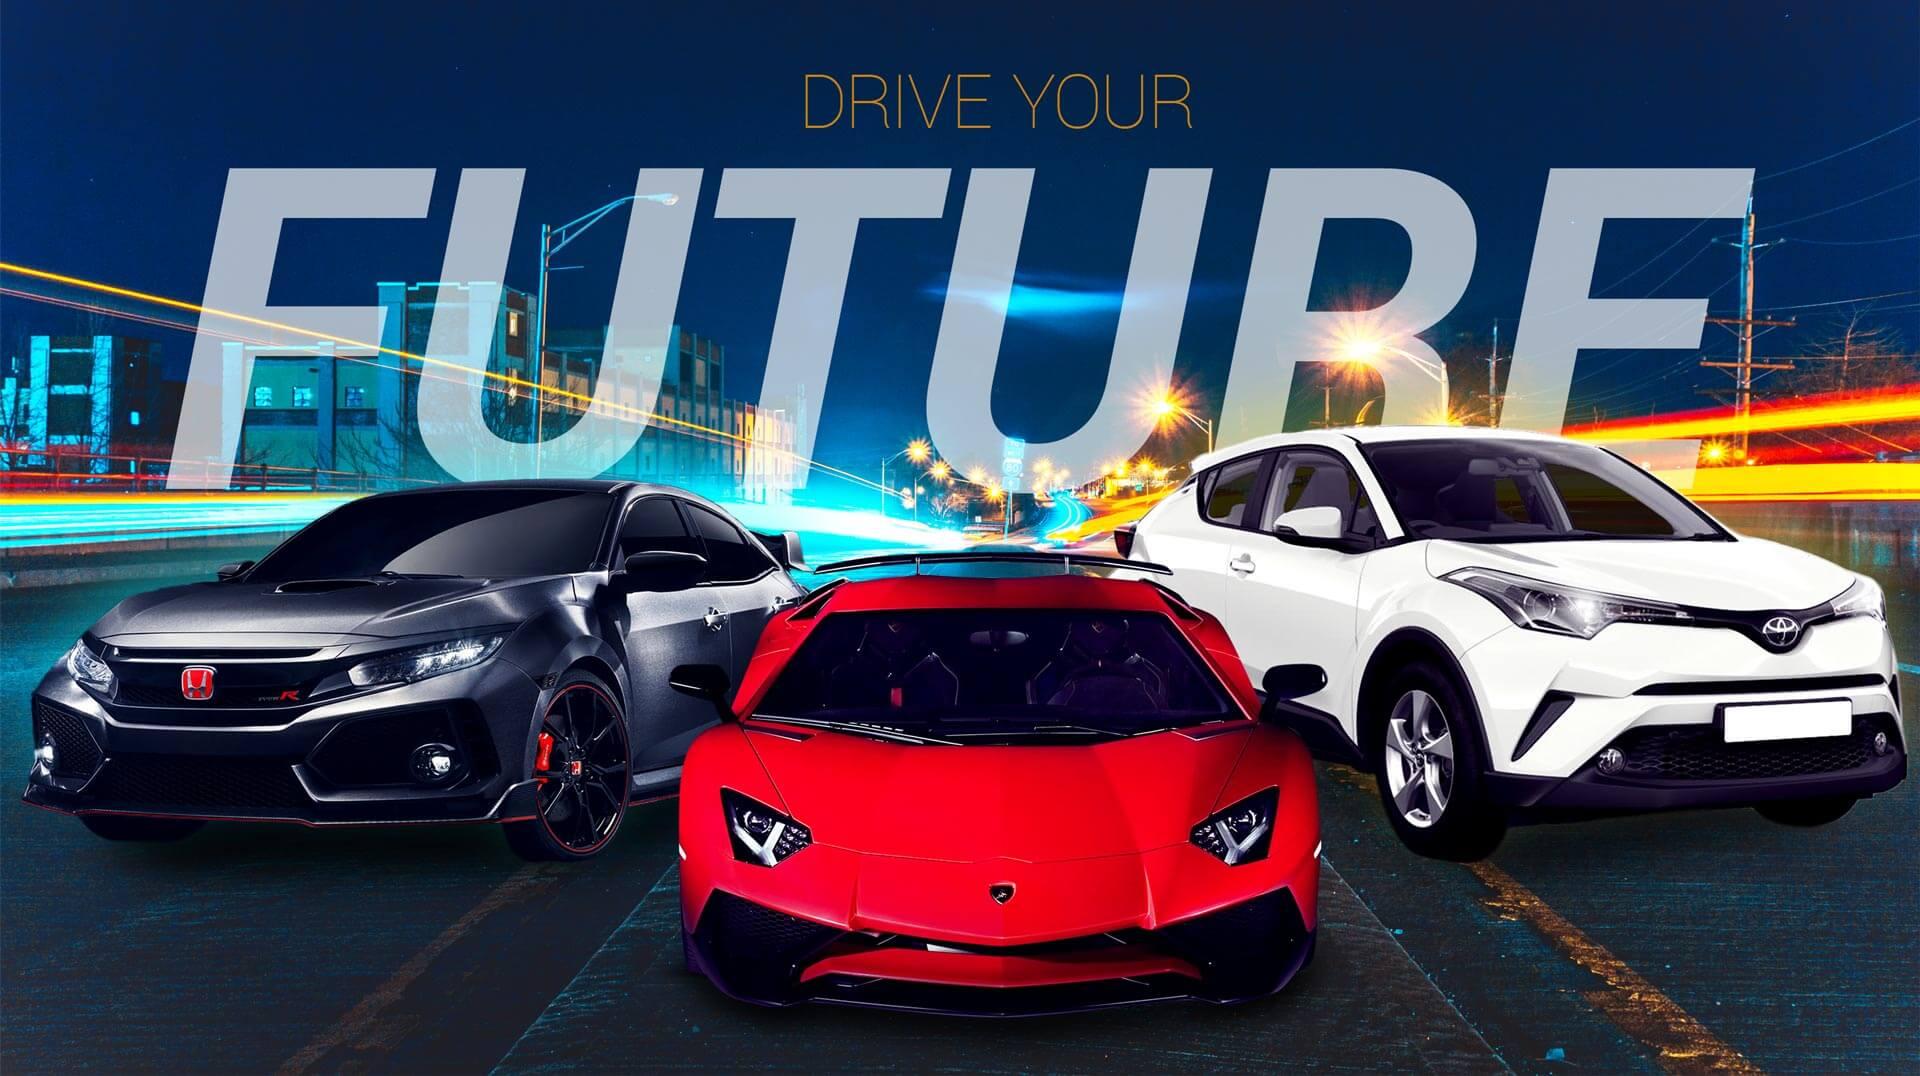 Asia Carz Singapores Trusted Reliable Car Dealer - Carz